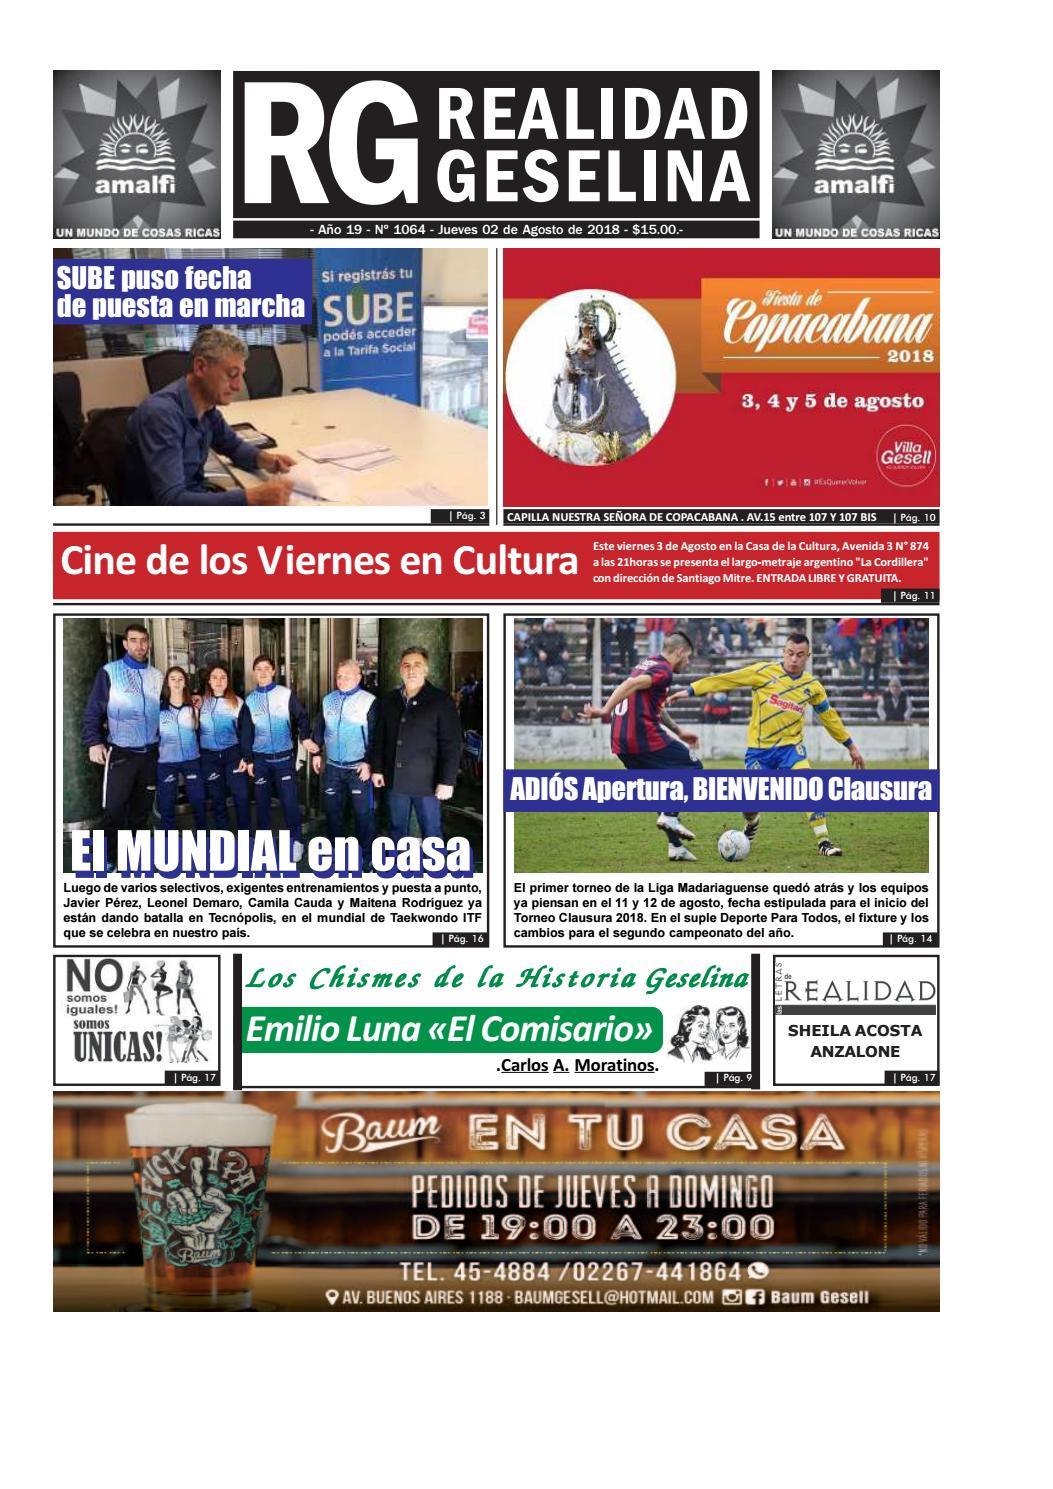 Geselina 1064 Realidad Issuu Semananrio By Semanario MVSpLqzUG